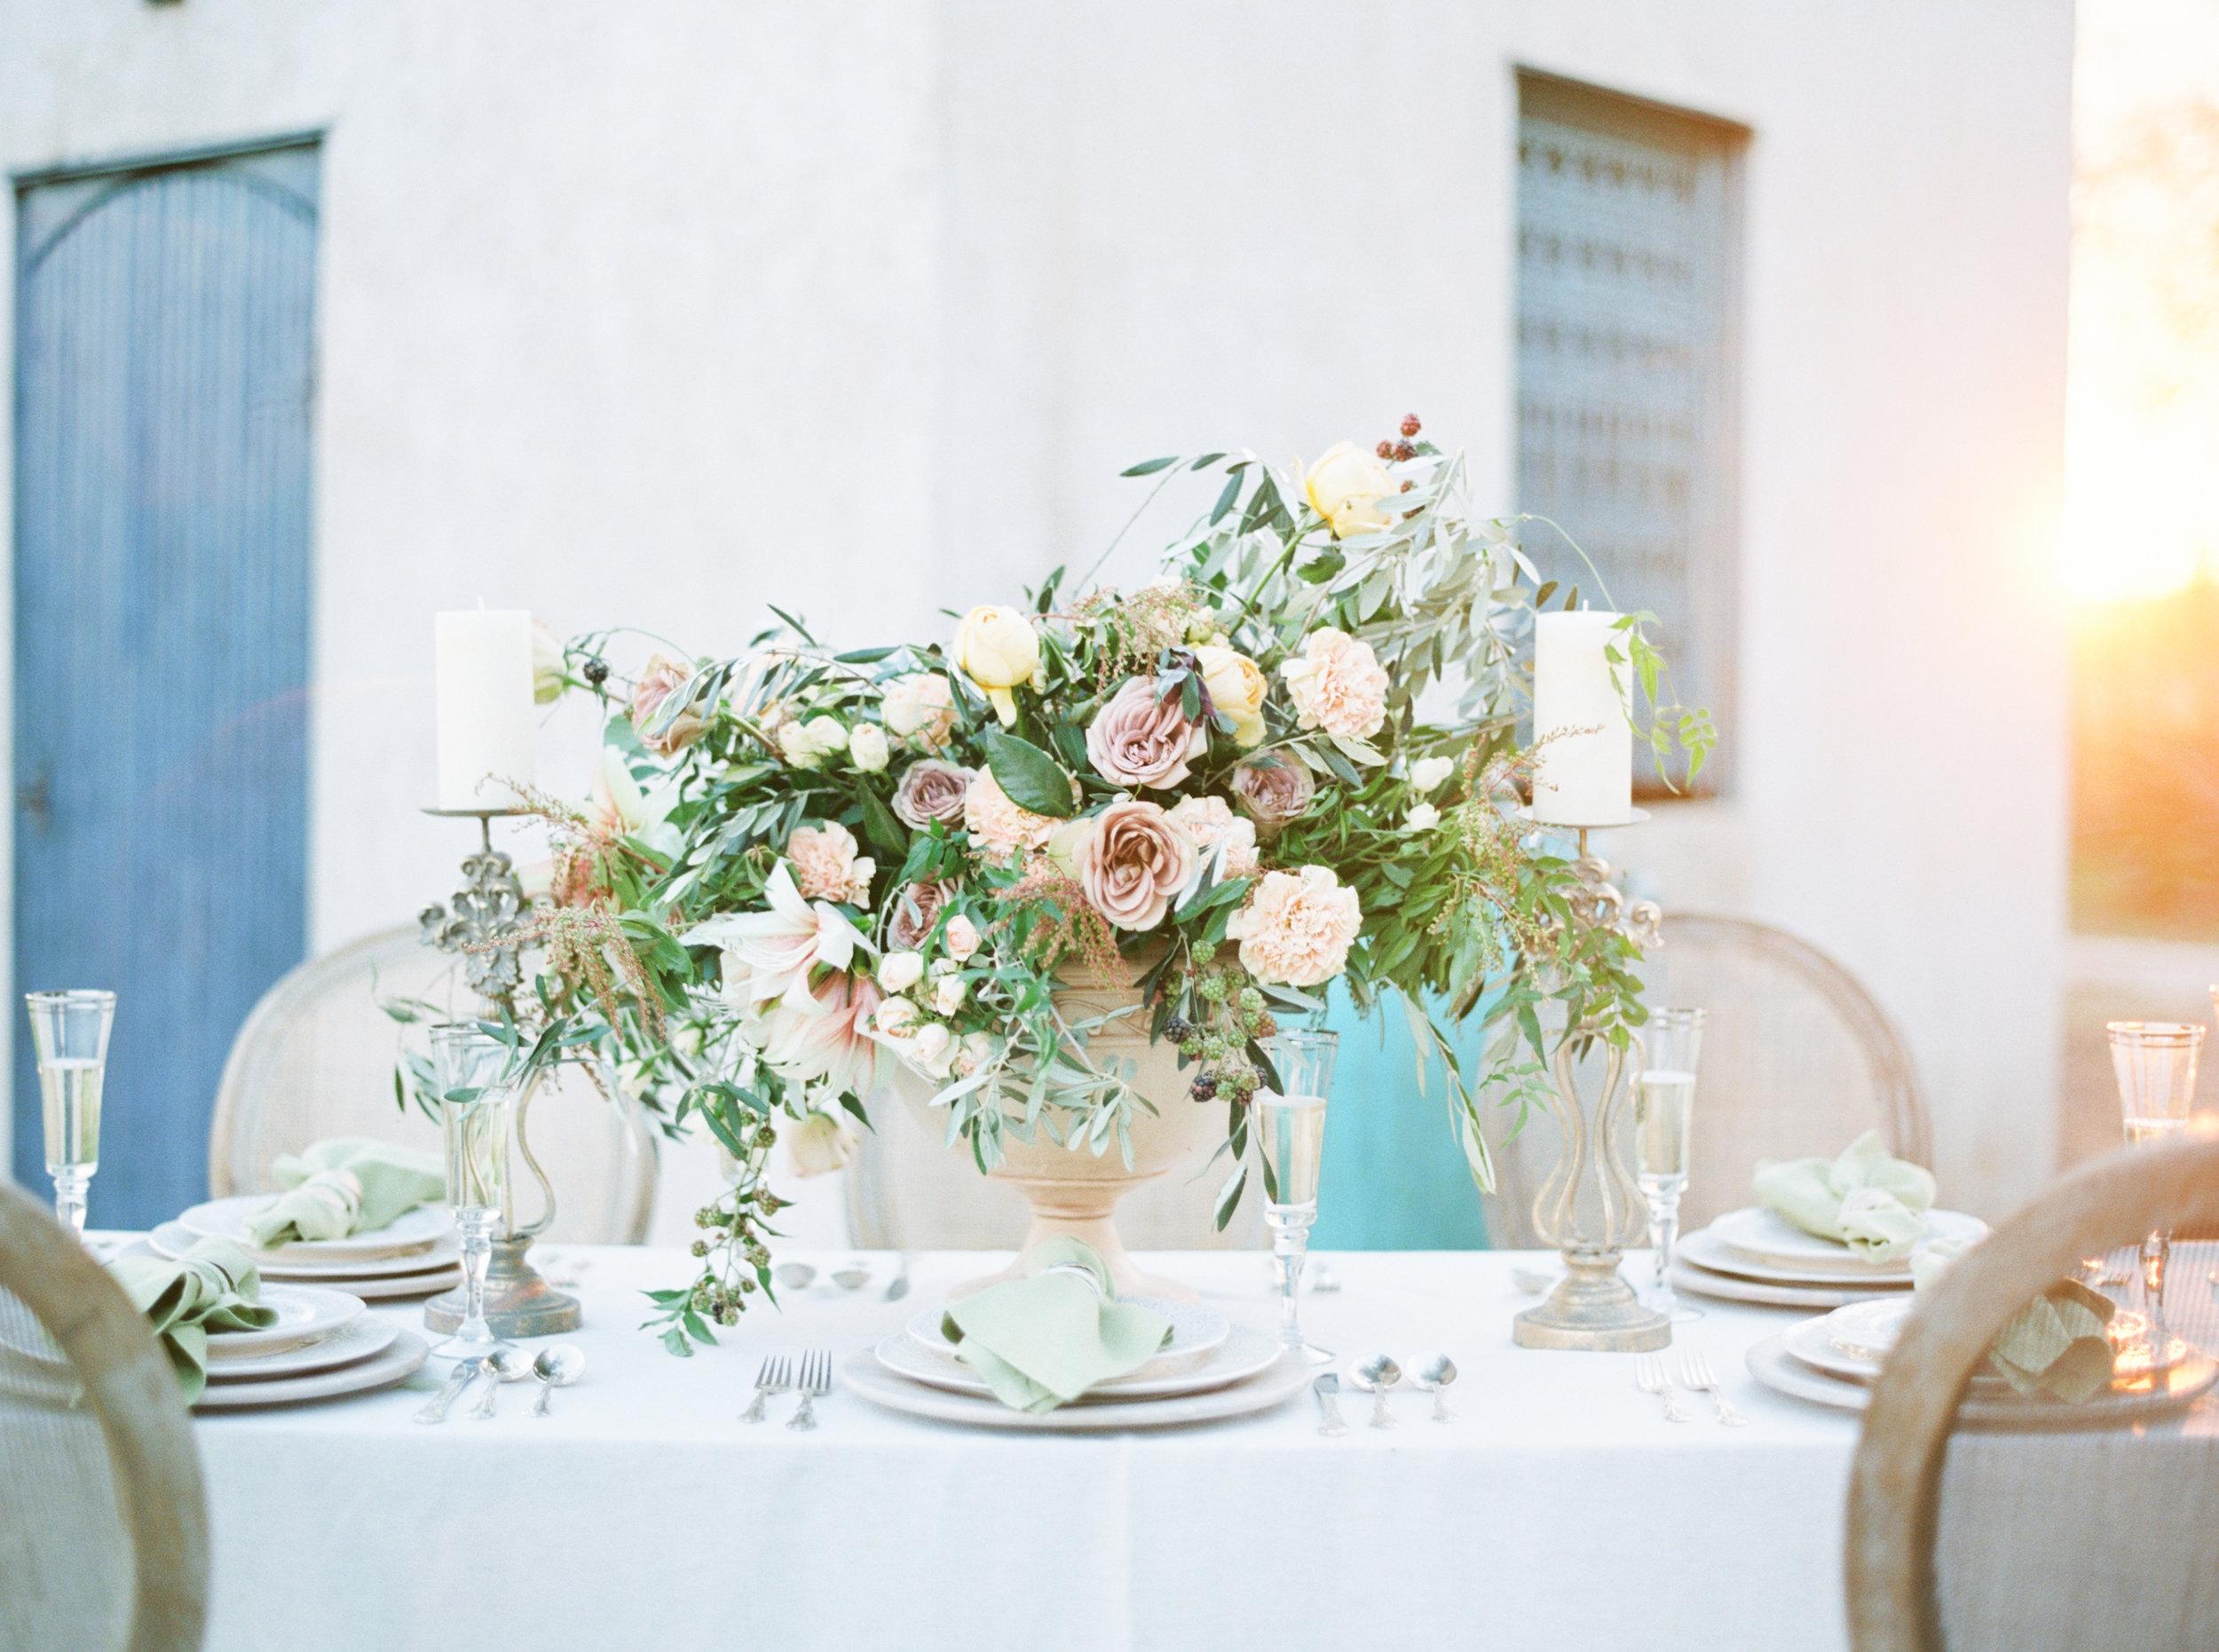 floral centerpiece austin wedding photographer jenna mcelroy